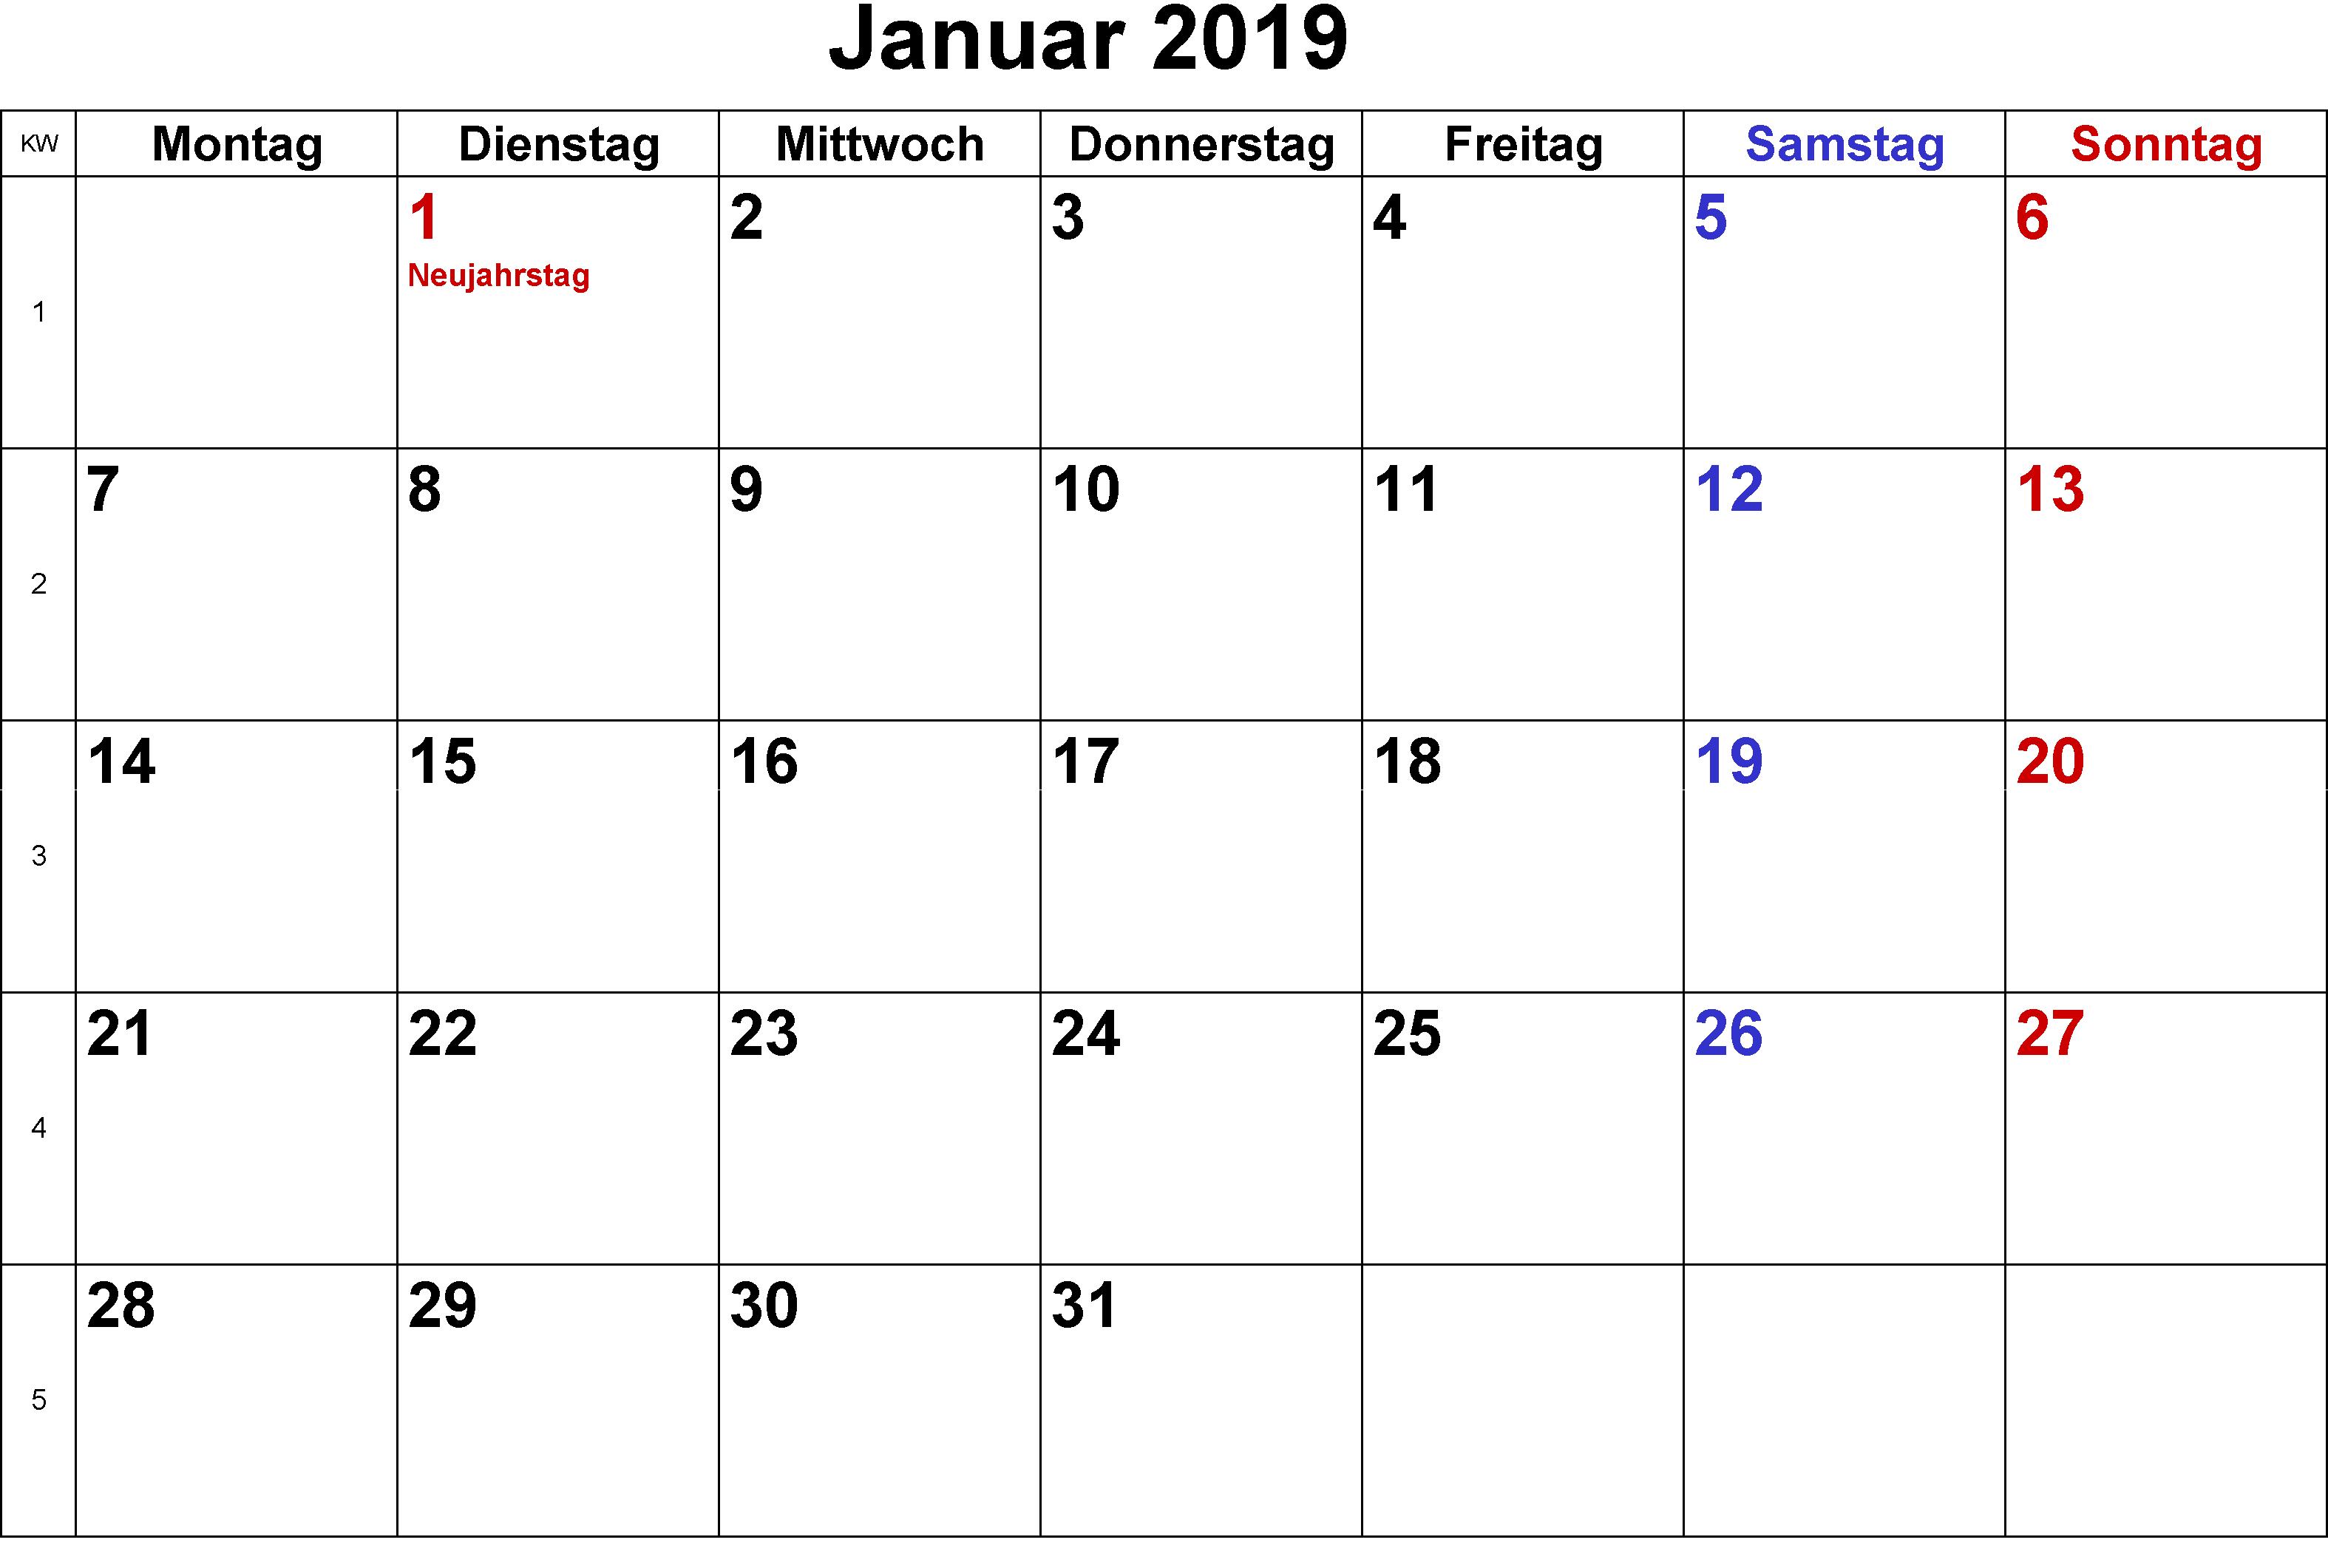 Mit Calendar 2019 Kalender Januar 2019 Mit Feiertagen | Kalender Januar 2019 Mit